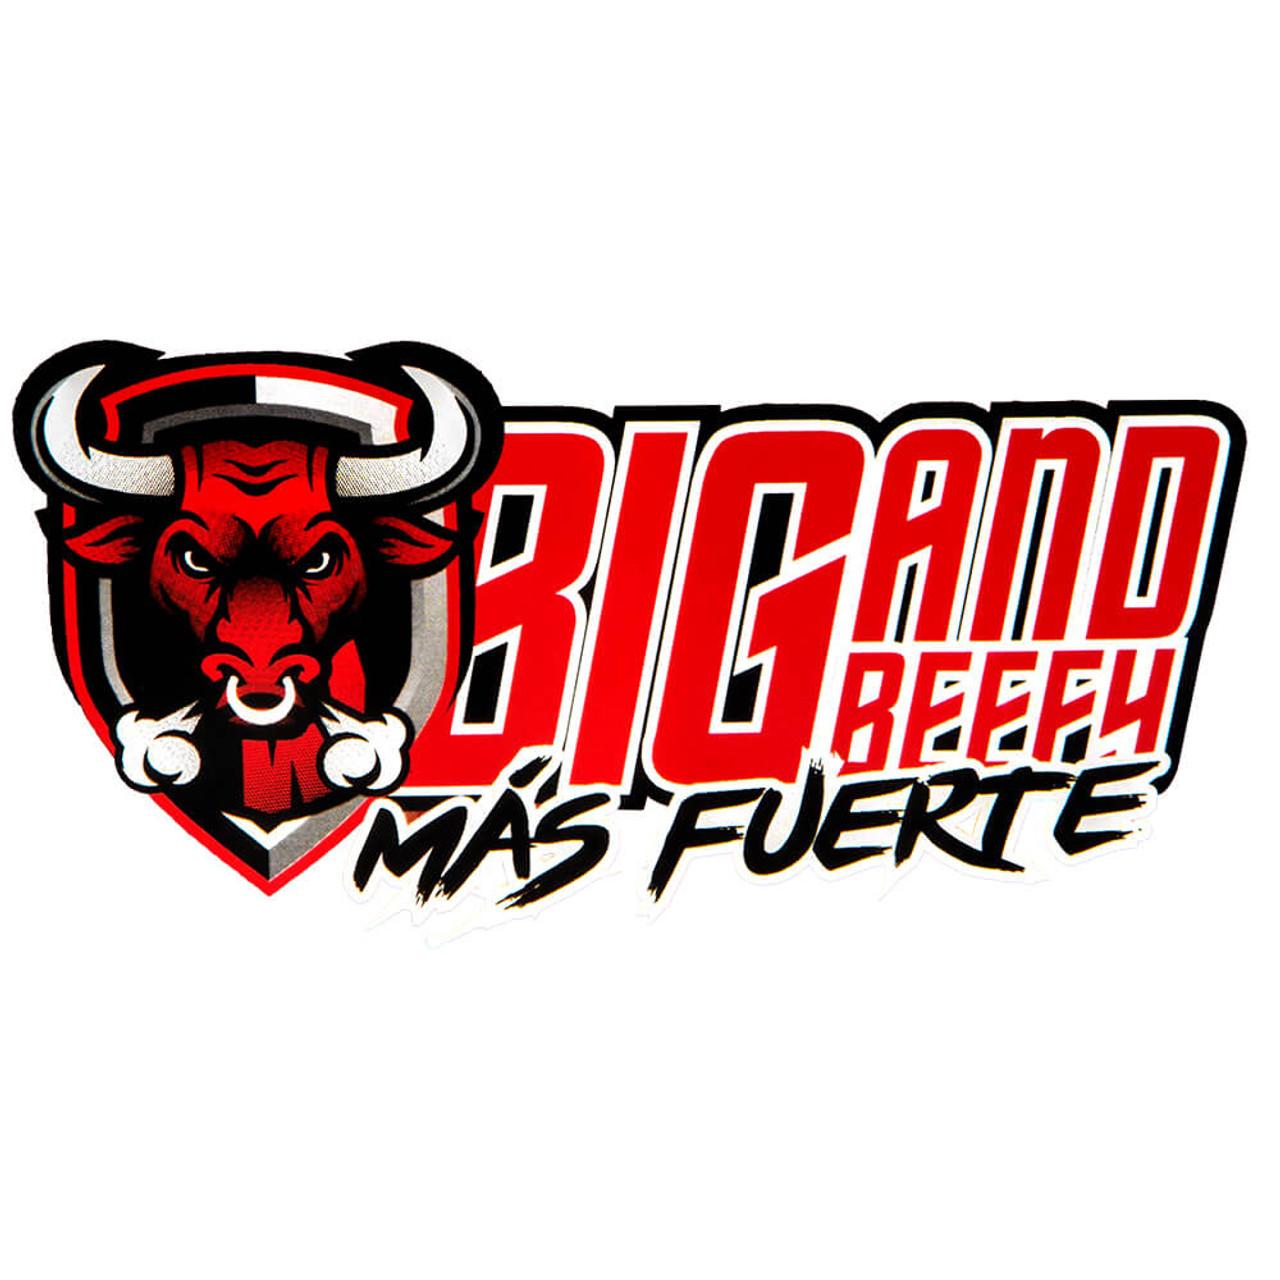 Big and Beefy Mas Fuerte No. 770 Cigars - 7 x 70 (Bundle of 10)